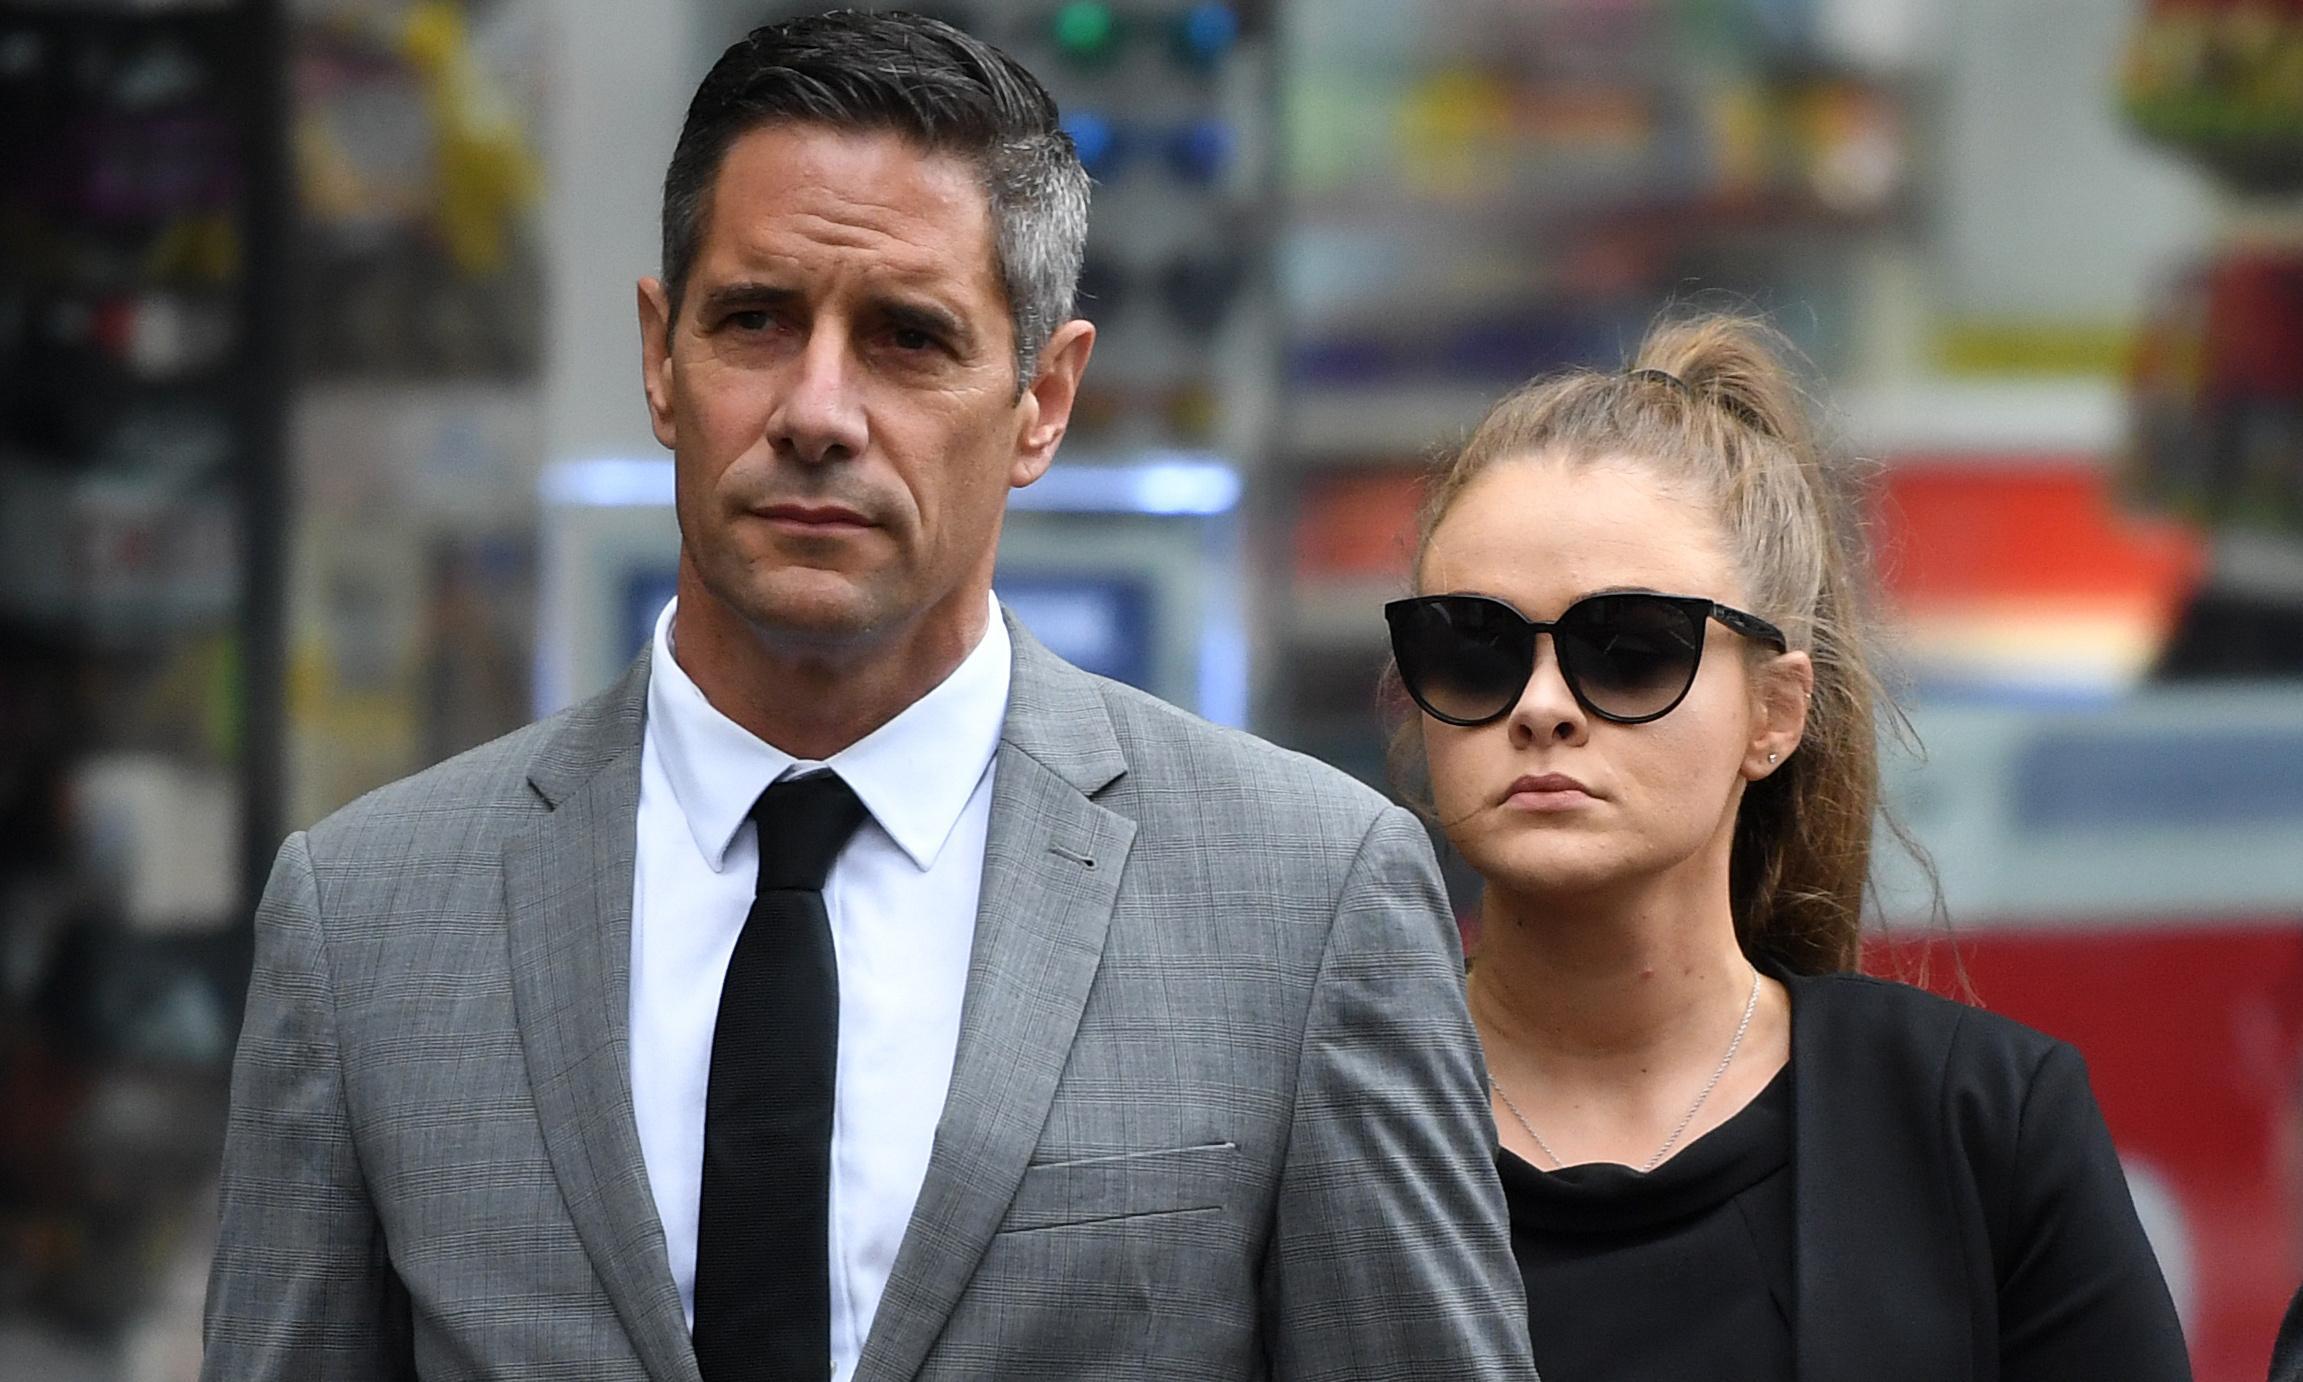 Roman Quaedvlieg's partner pleads guilty to misleading corruption investigators